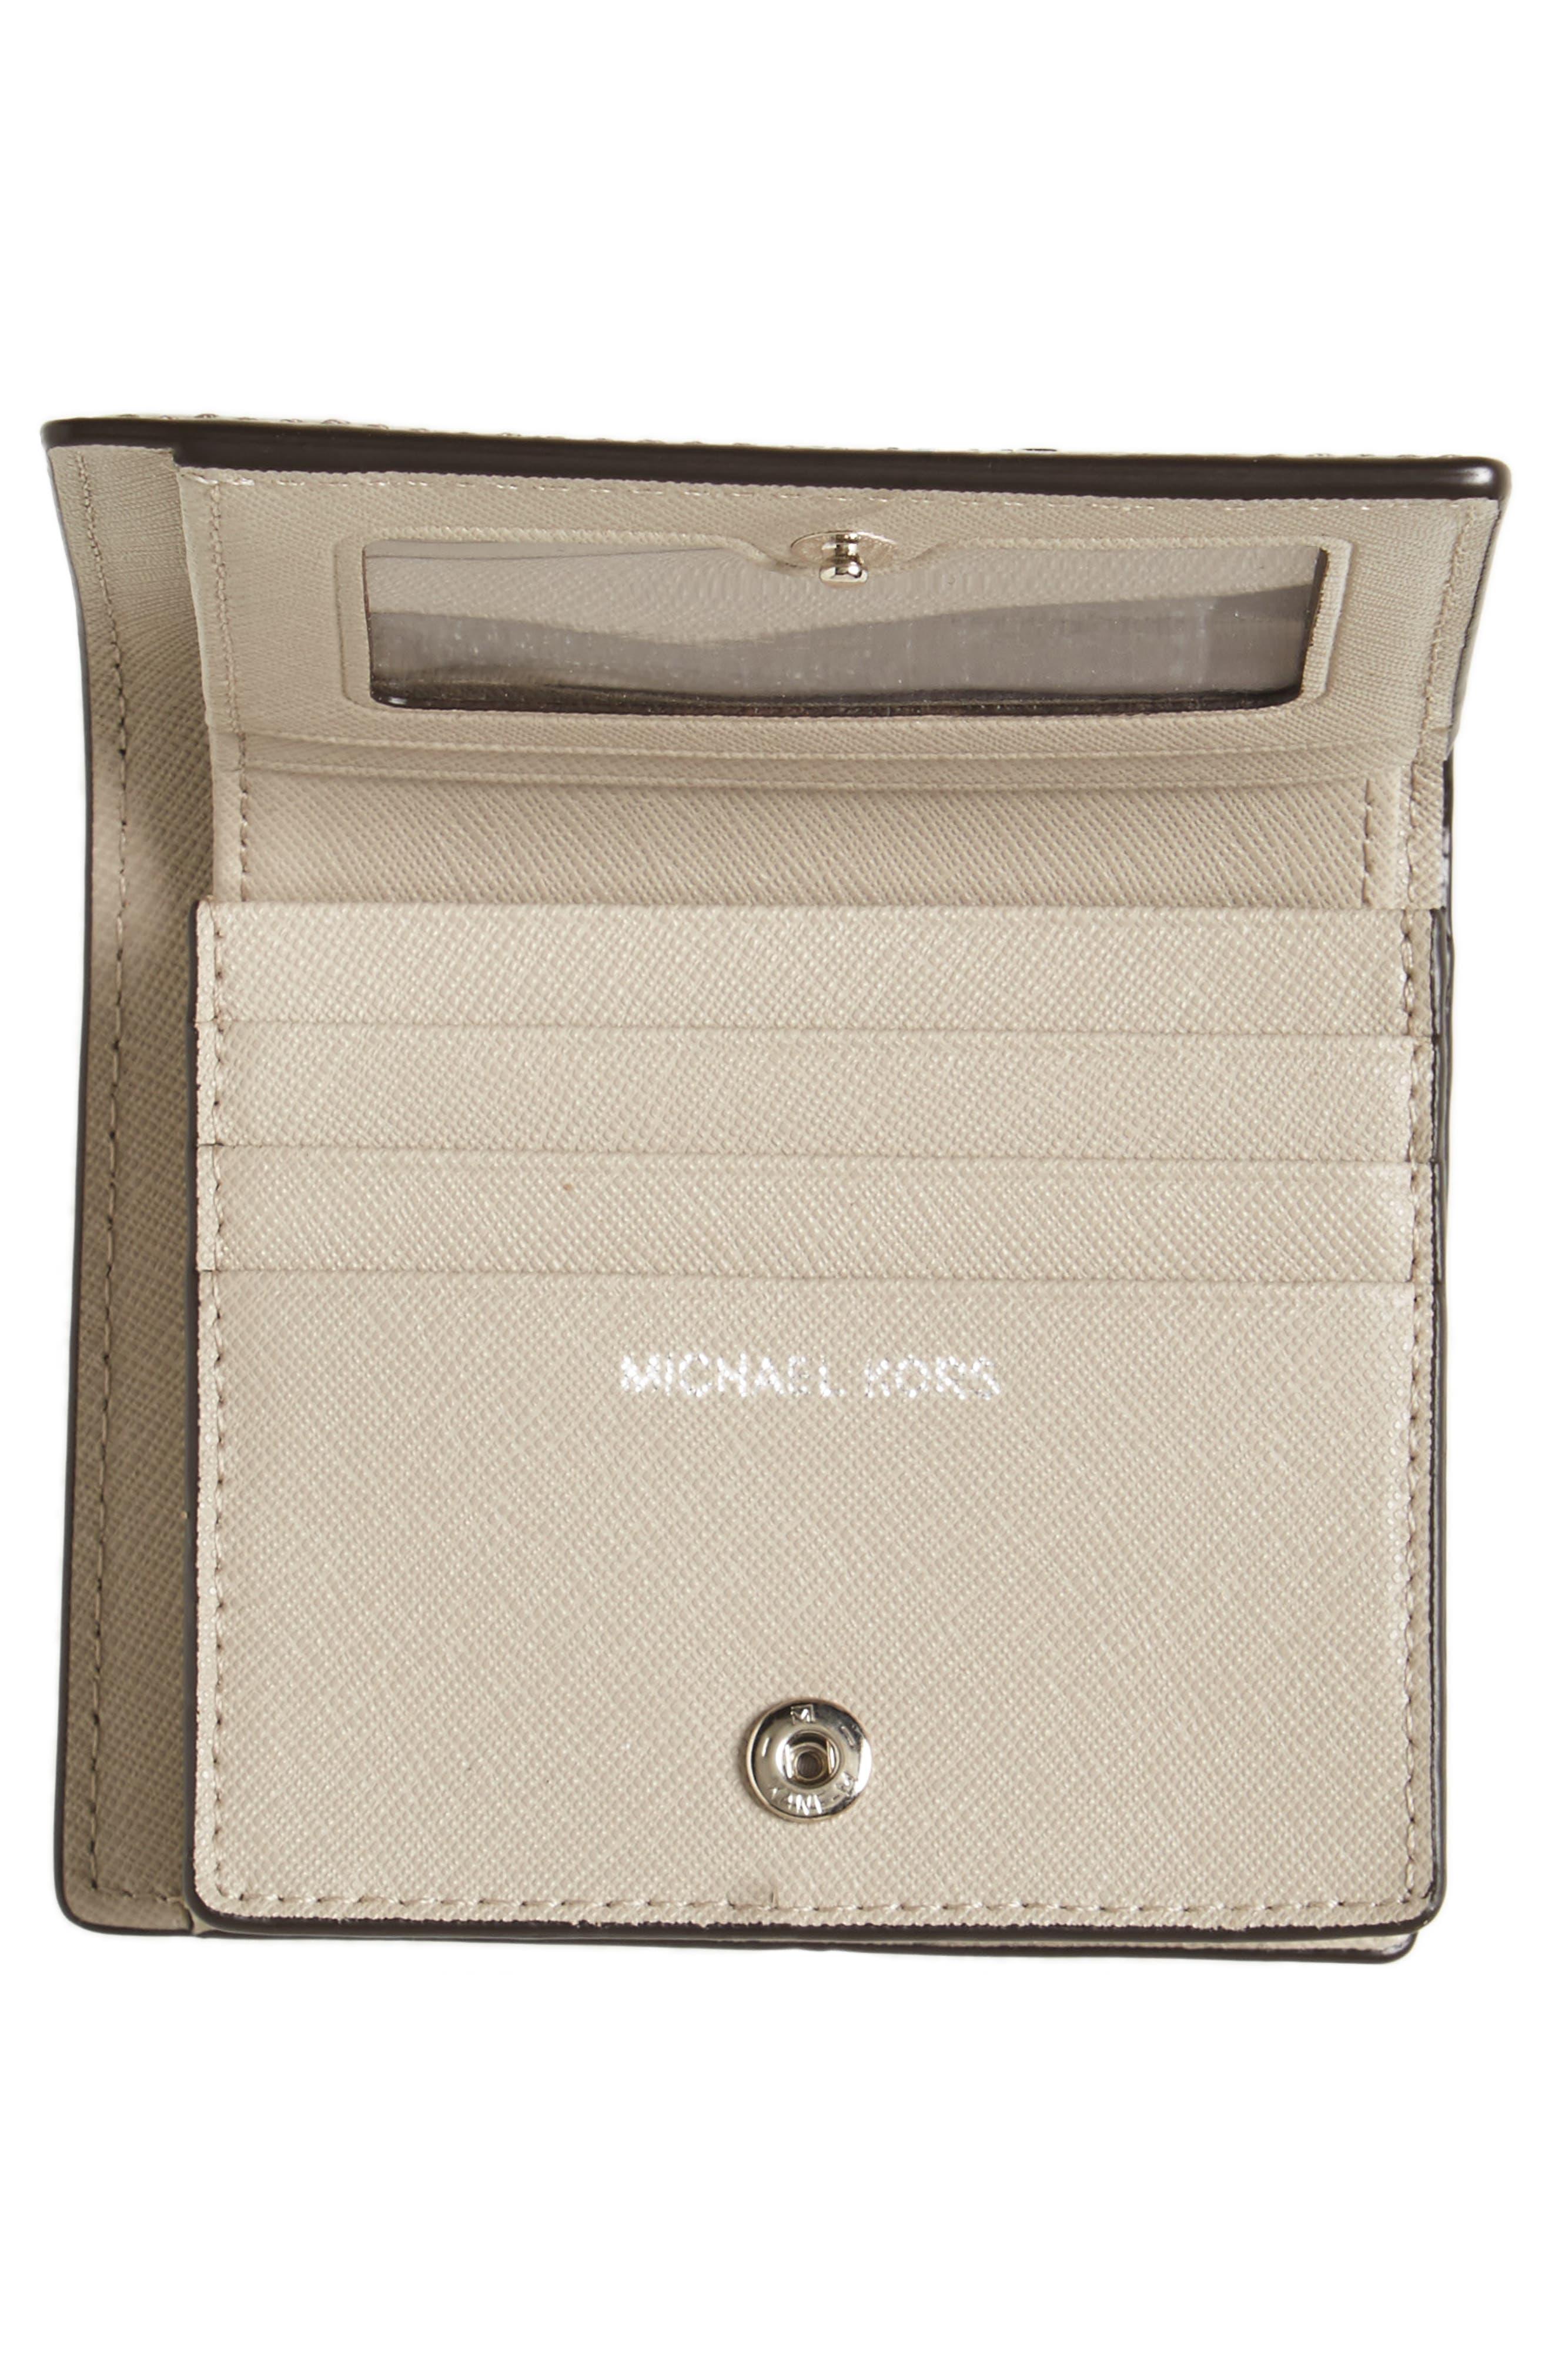 Mercer Leather RFID Cardholder Wallet,                             Alternate thumbnail 2, color,                             292